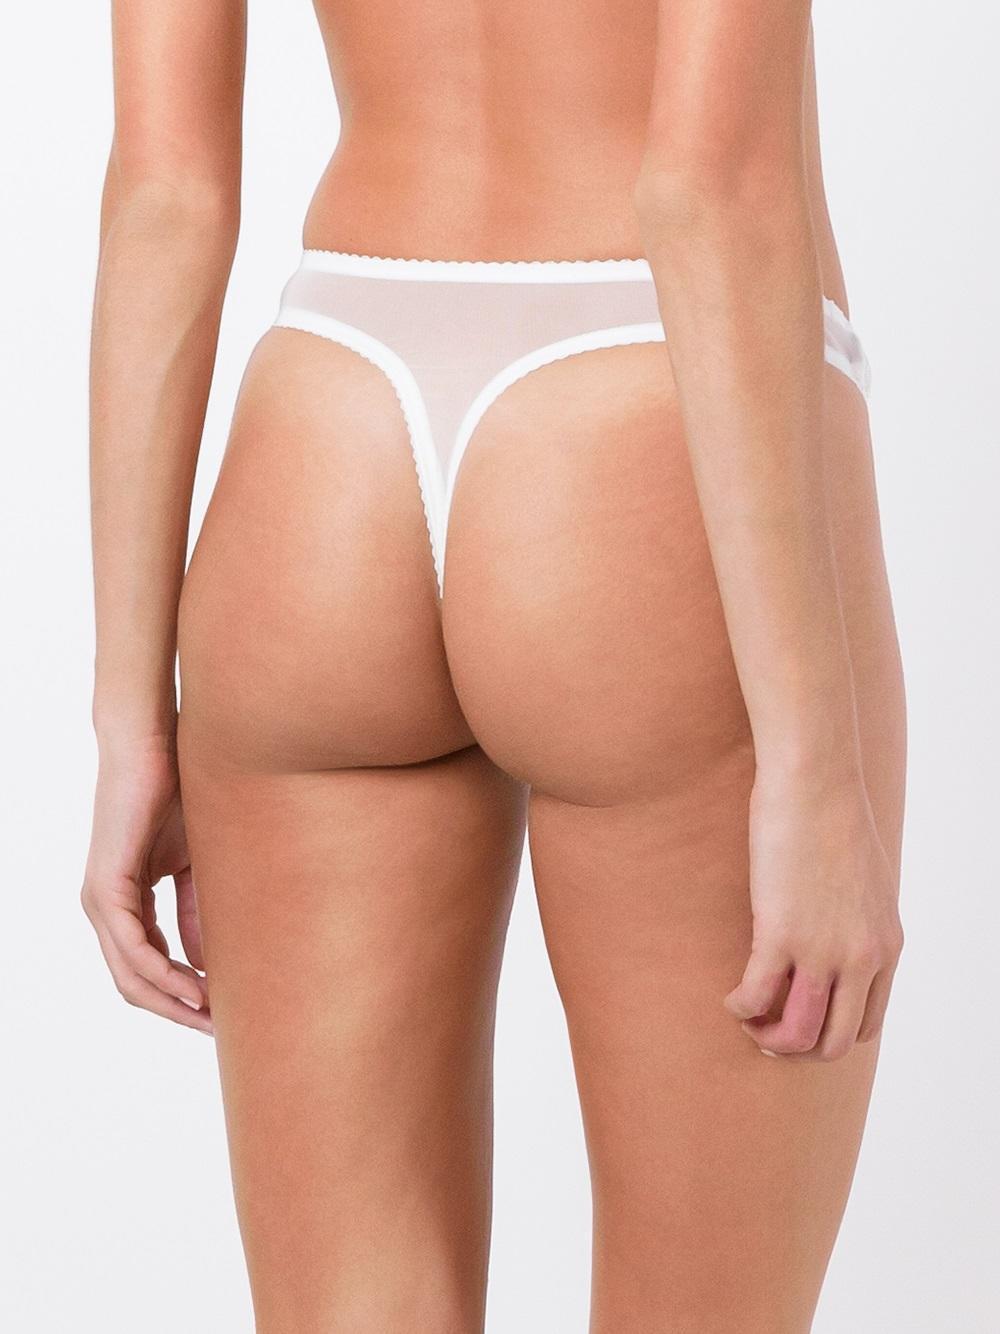 Gilda & Pearl Gilda for Dolci thong - Nude & Neutrals Gilda & Pearl Clearance Amazon Cheap From China mjMMUbks